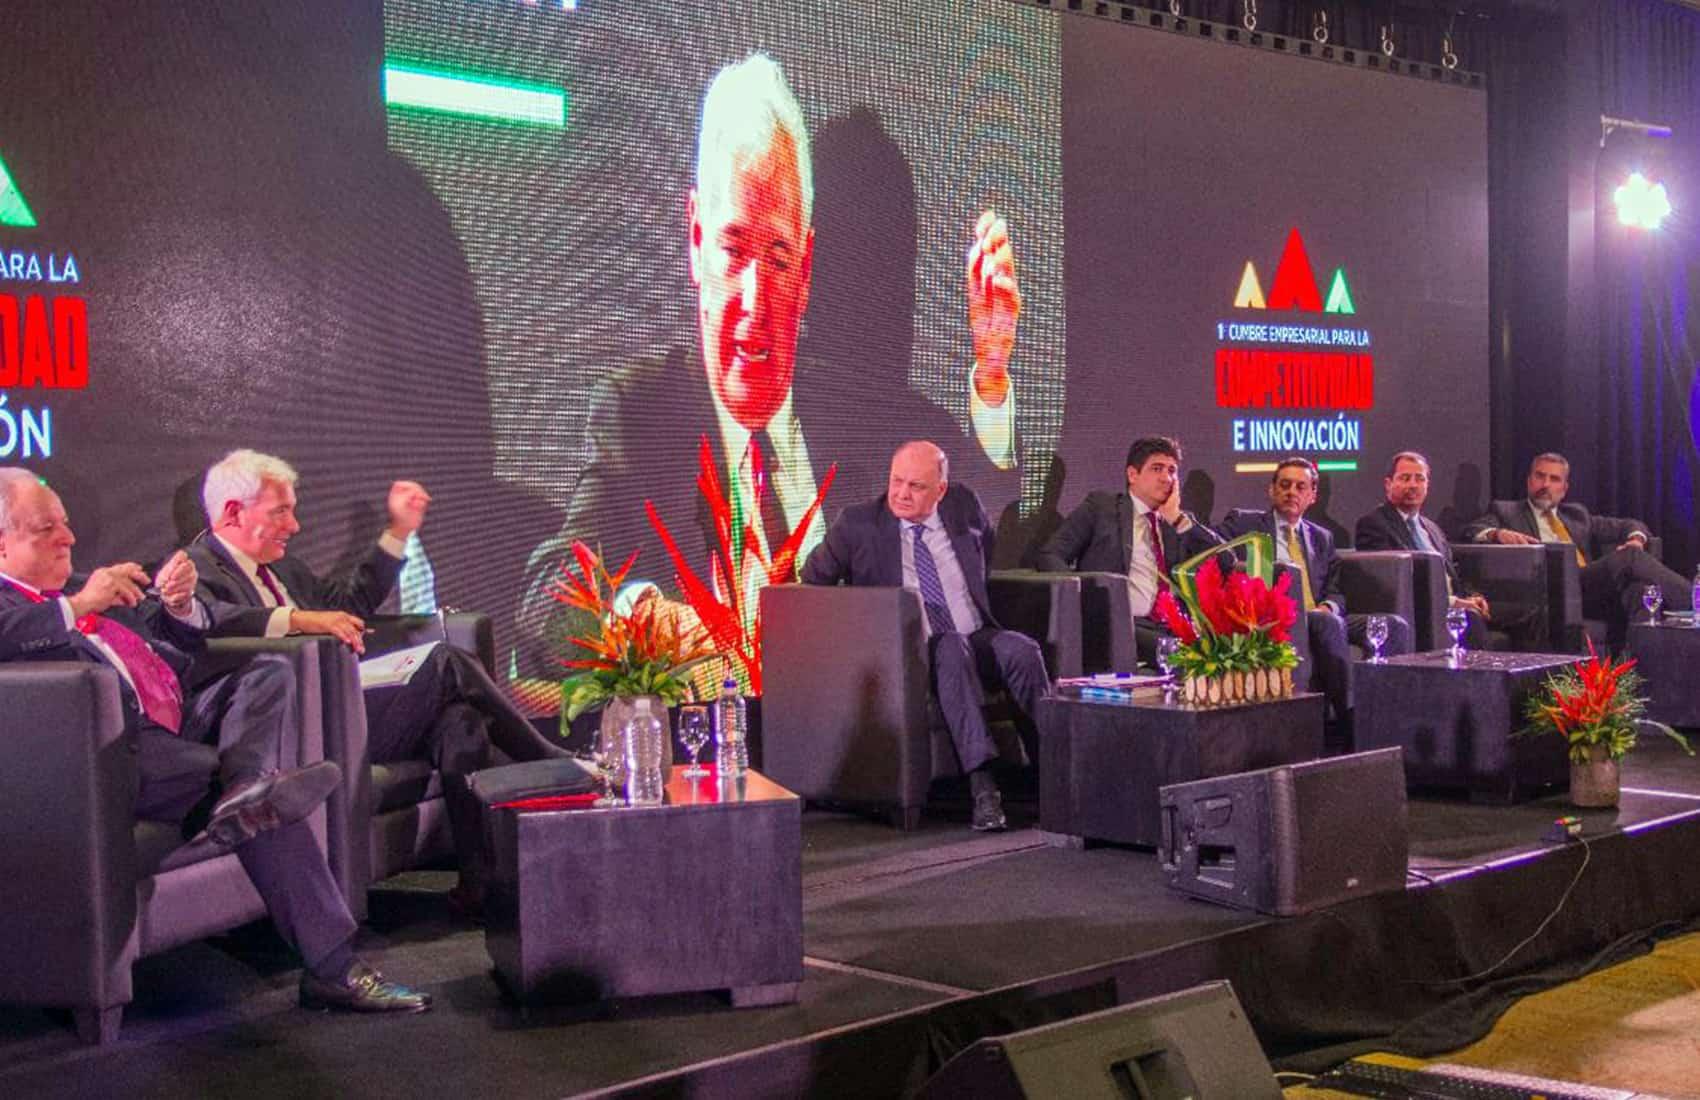 CICR's Presidential Debate, RECOPE monopoly. July 27, 2017.